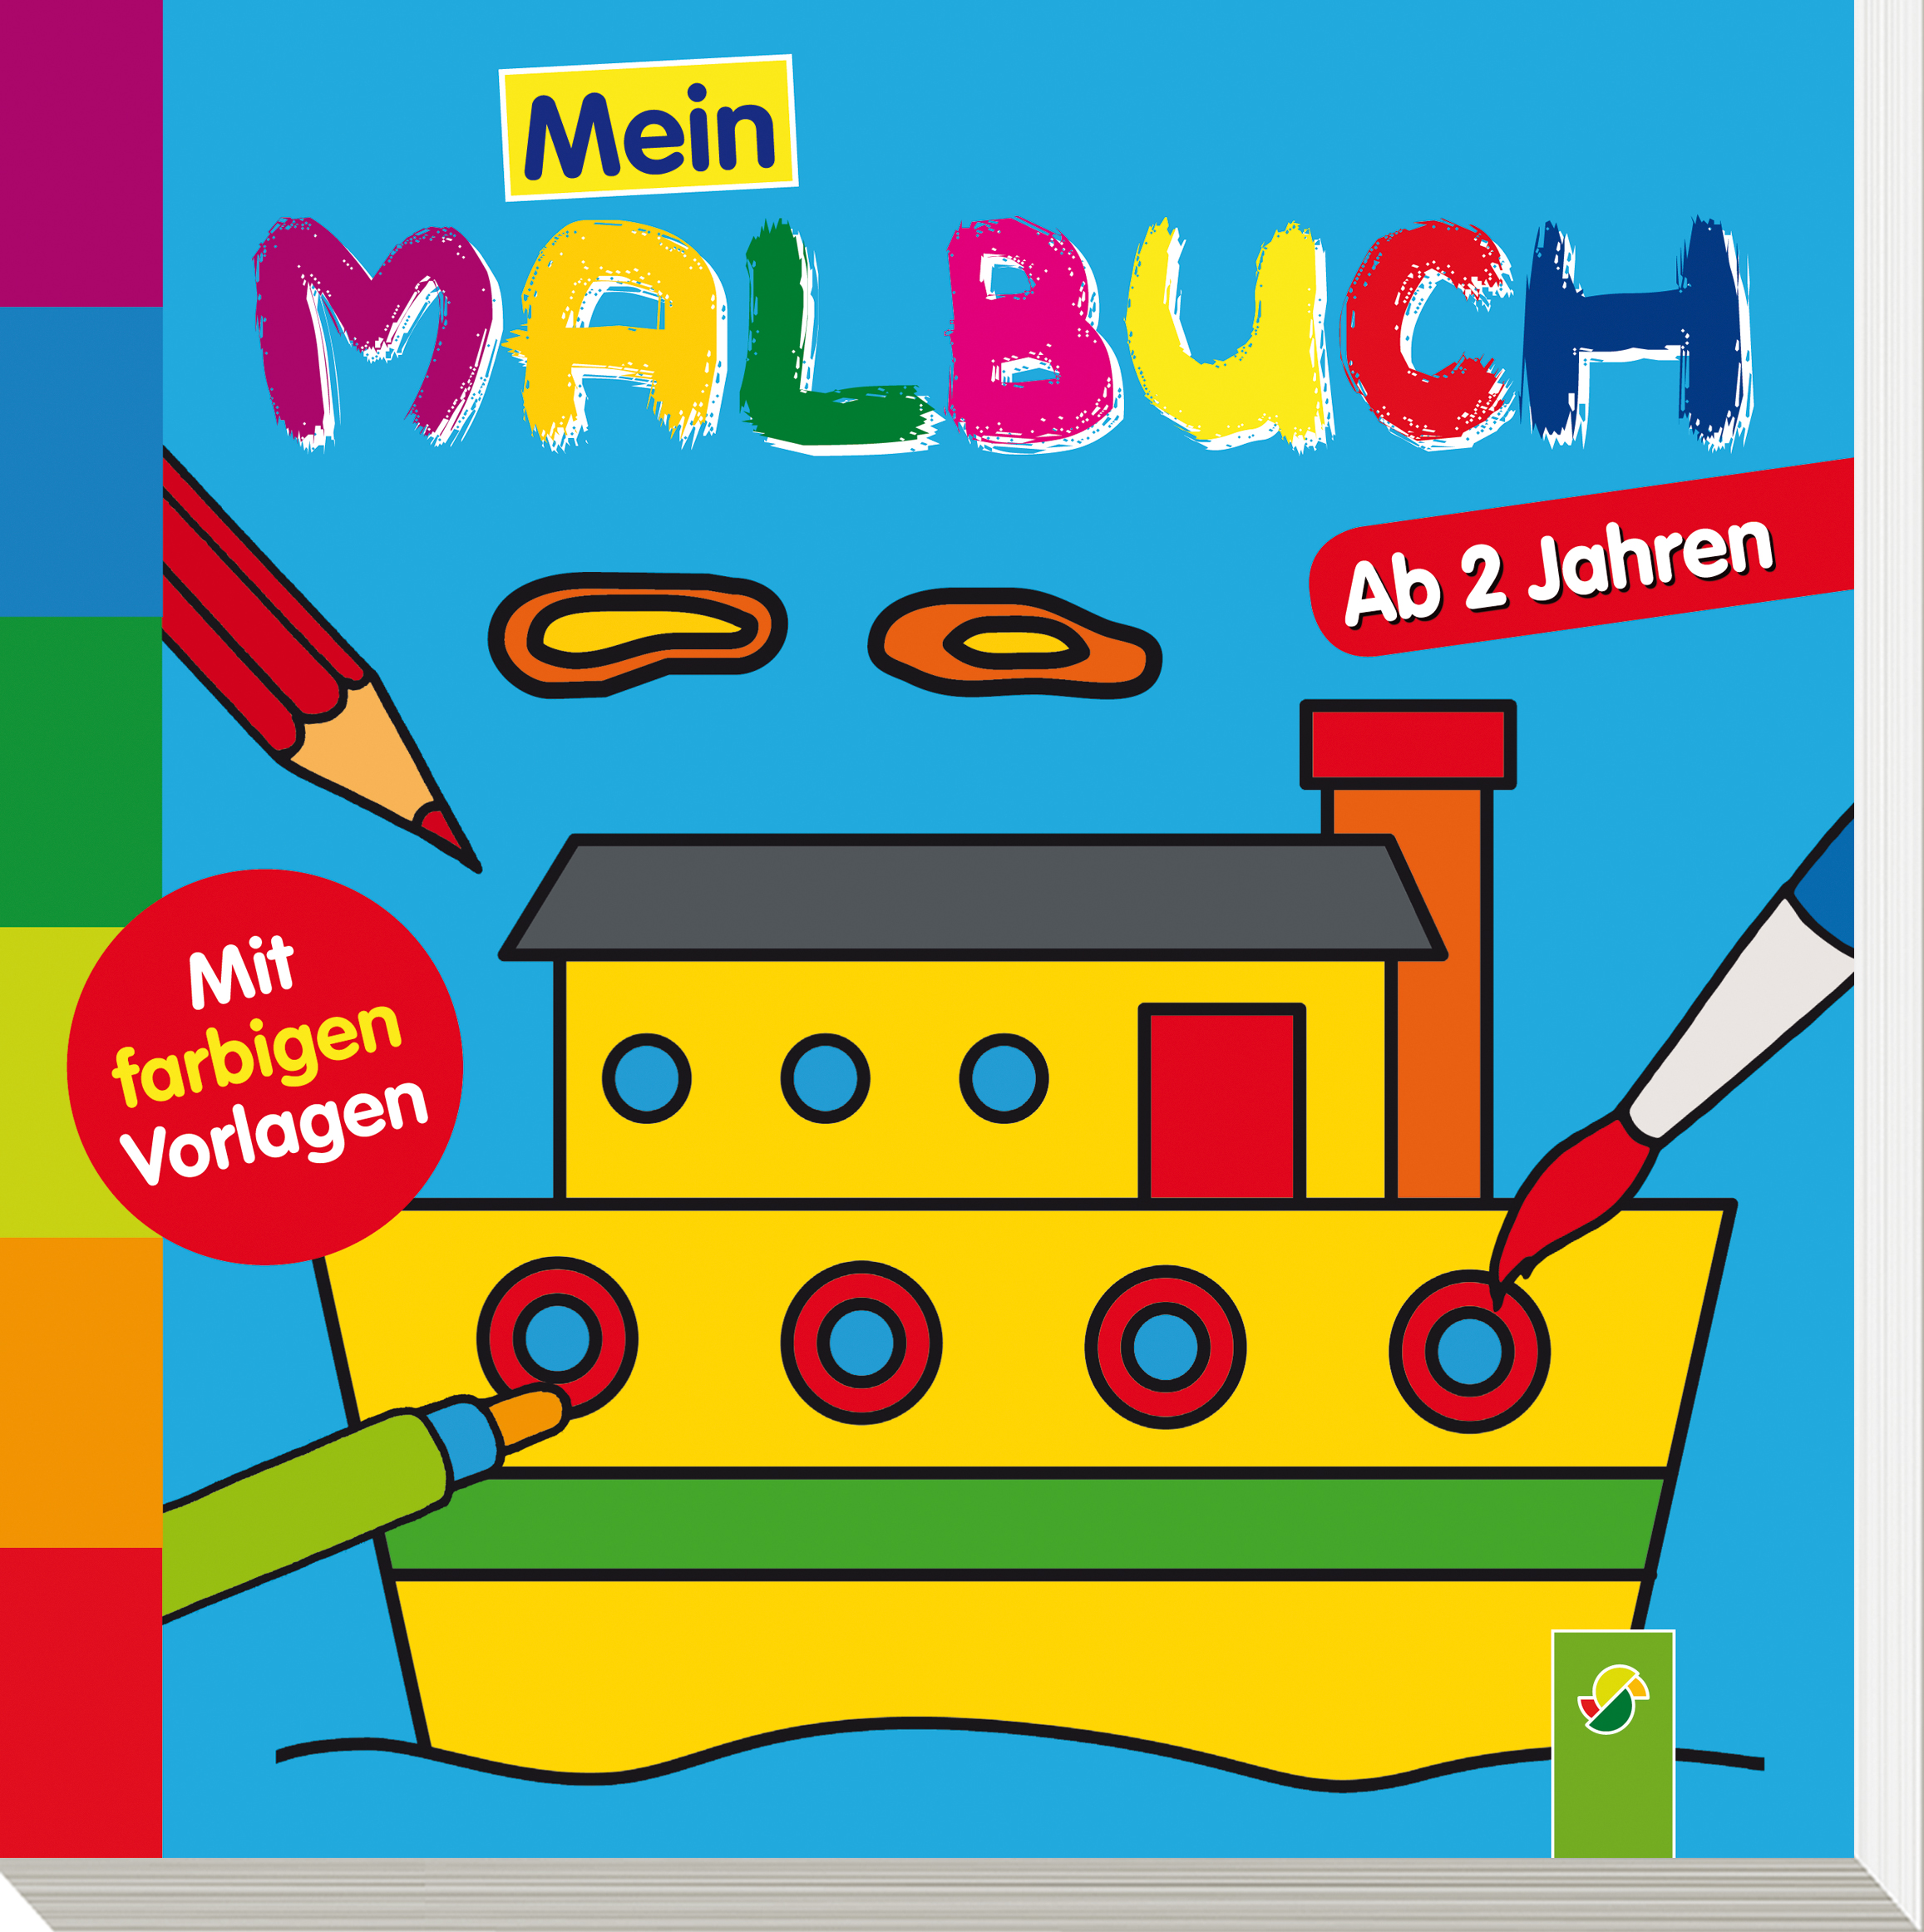 MEIN MALBUCH (SCHIFF) Christian Ortega 9783849904333 - EUR 3,99 ...